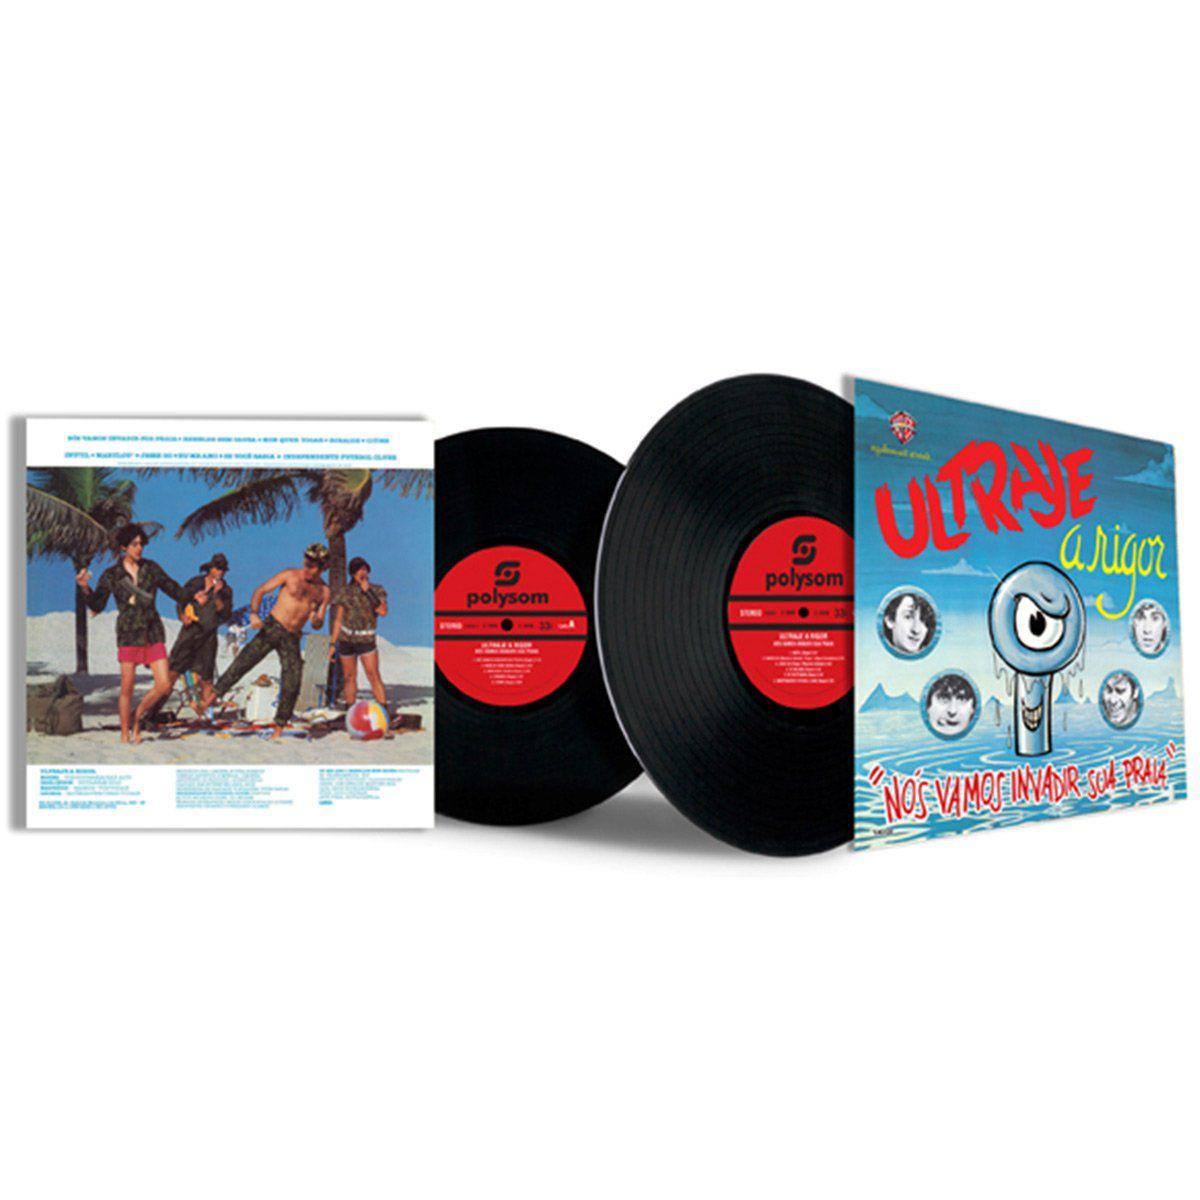 Ultraje A Rigor LP Nos Vamos Invadir Sua Praia  - bandUP Store Marketplace